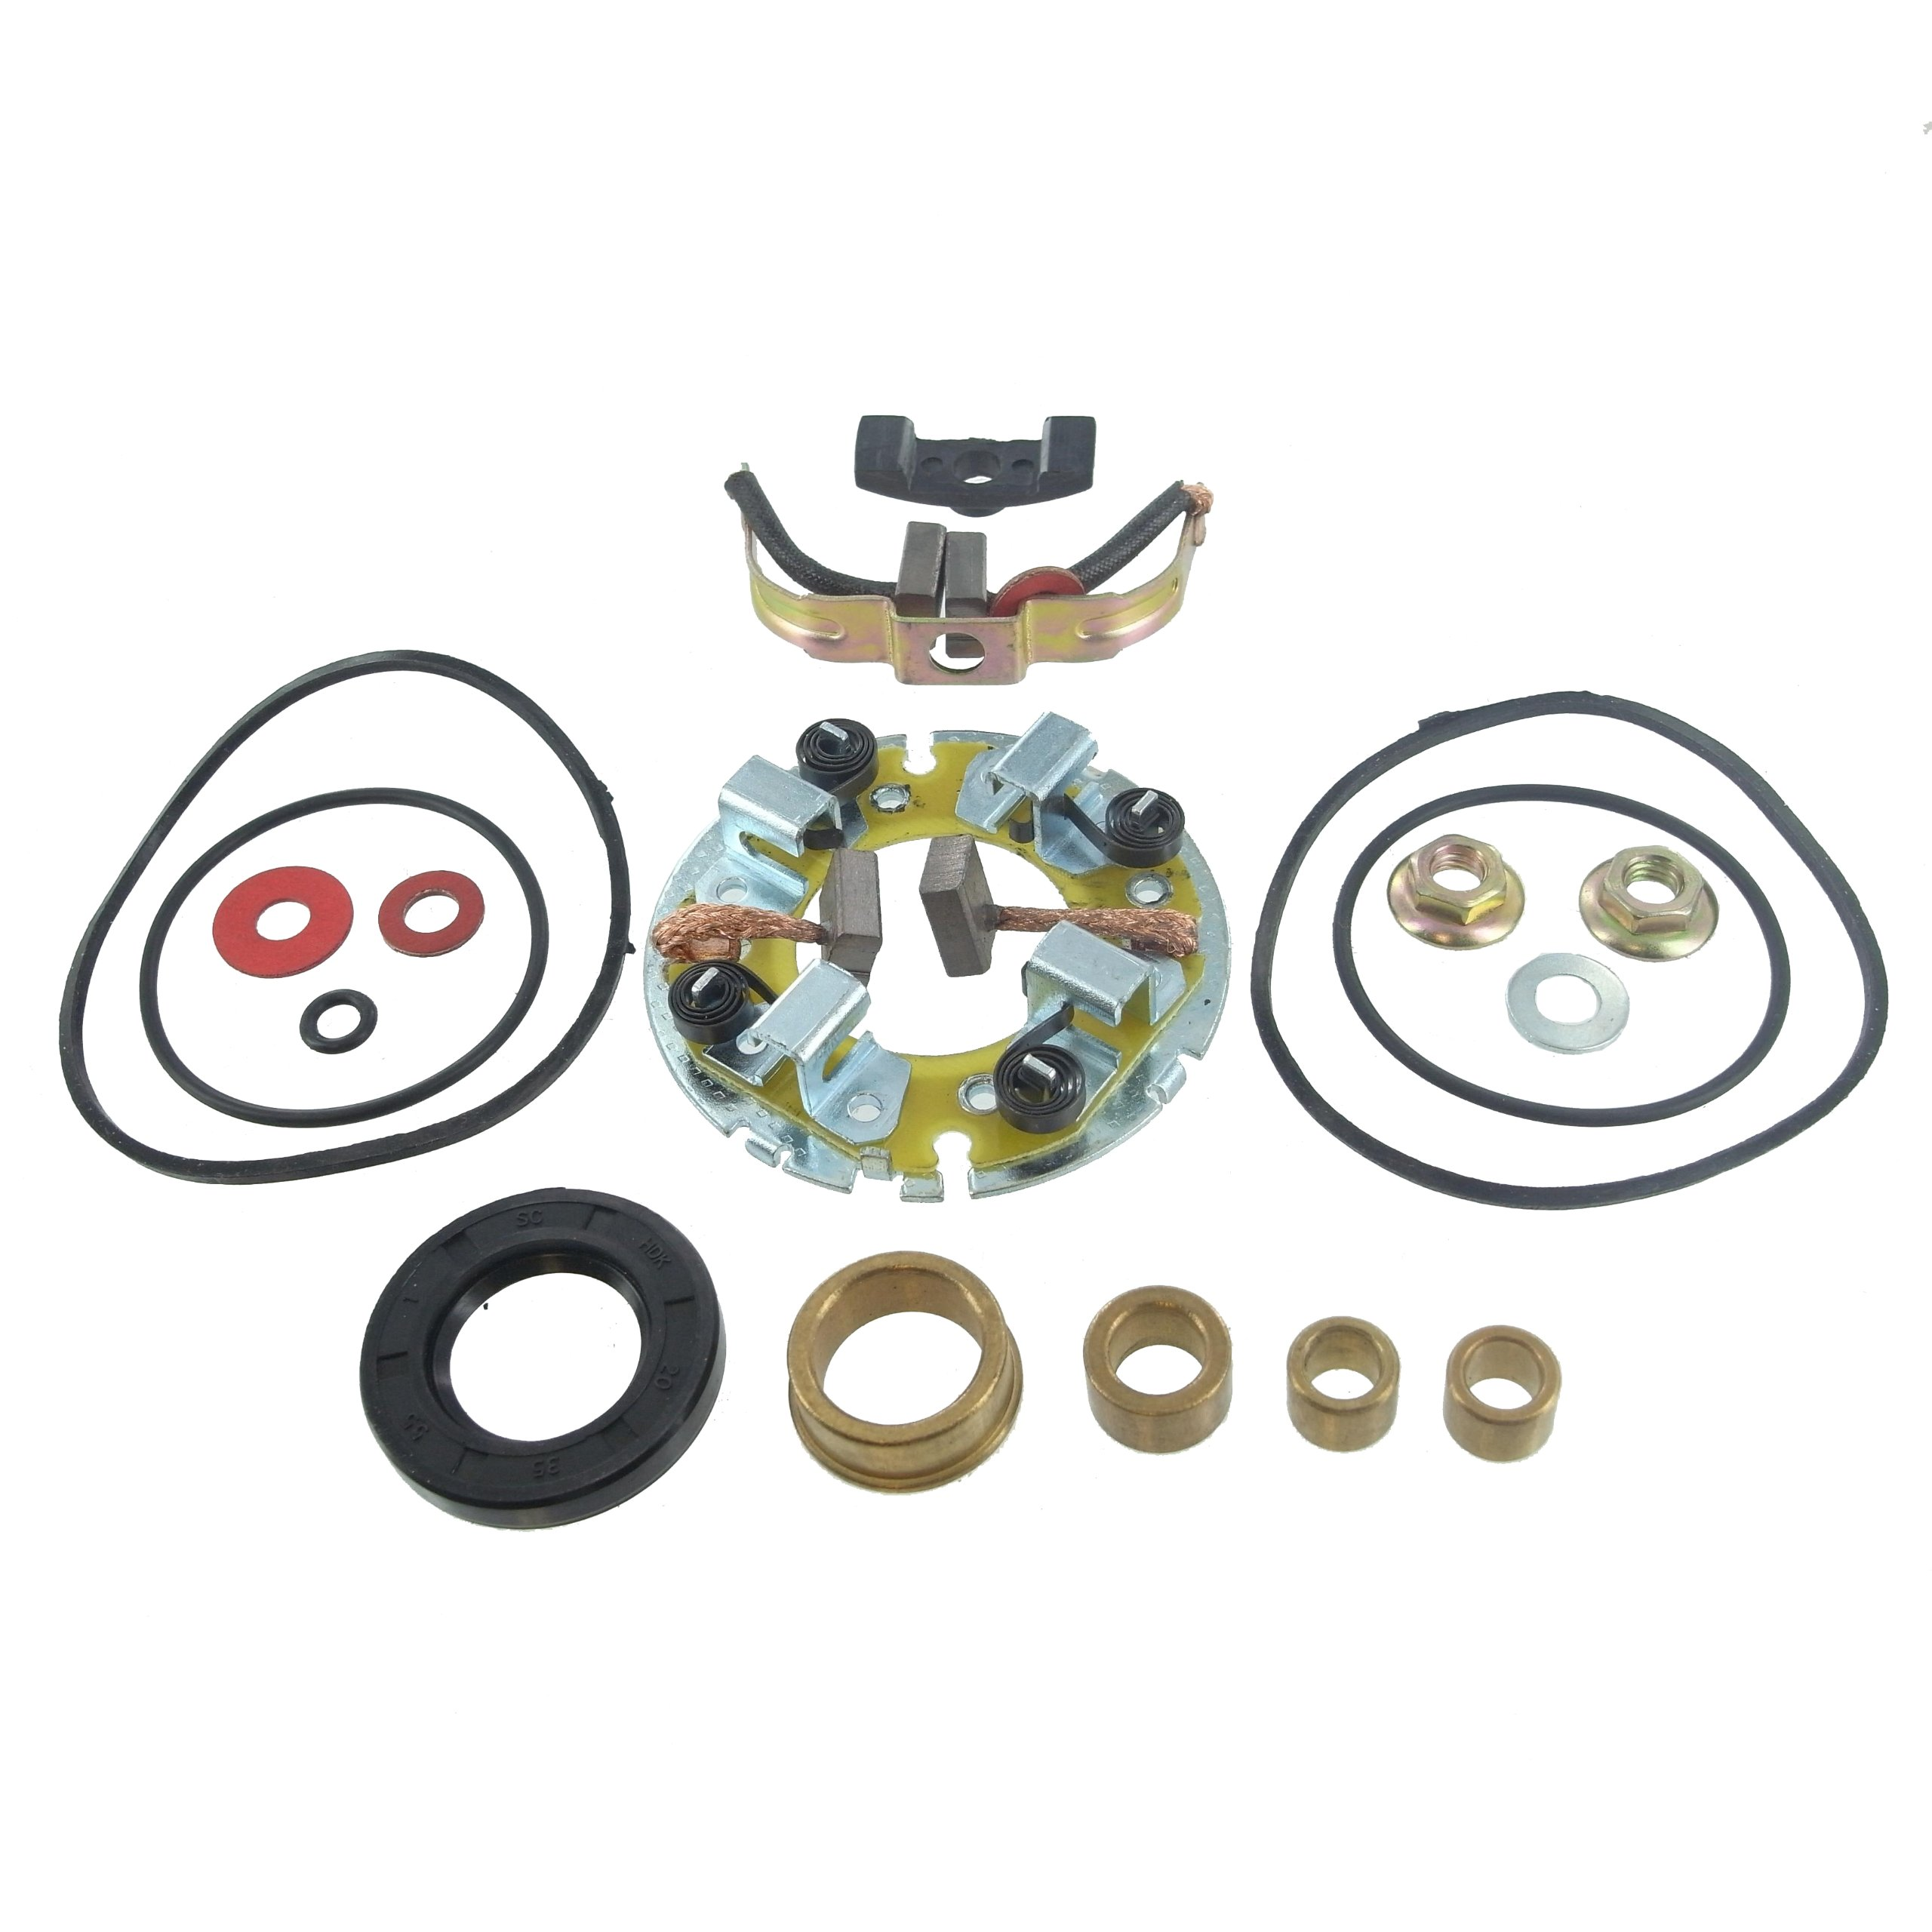 Starter Motor Repair Kit for Kawasaki ATV KLT200 198cc 82-84 KLT250 246cc 83-85 KLF300 Bayou 290cc 86-88, Motorcycle KZ250 CSR 250cc 80-83 KZ440 LTD / Sports / Standard 440cc 80-83, Yamaha XS400 XS400S 392cc 81-82 SM-8203, 21163-1011, 4R4-81800-60-00